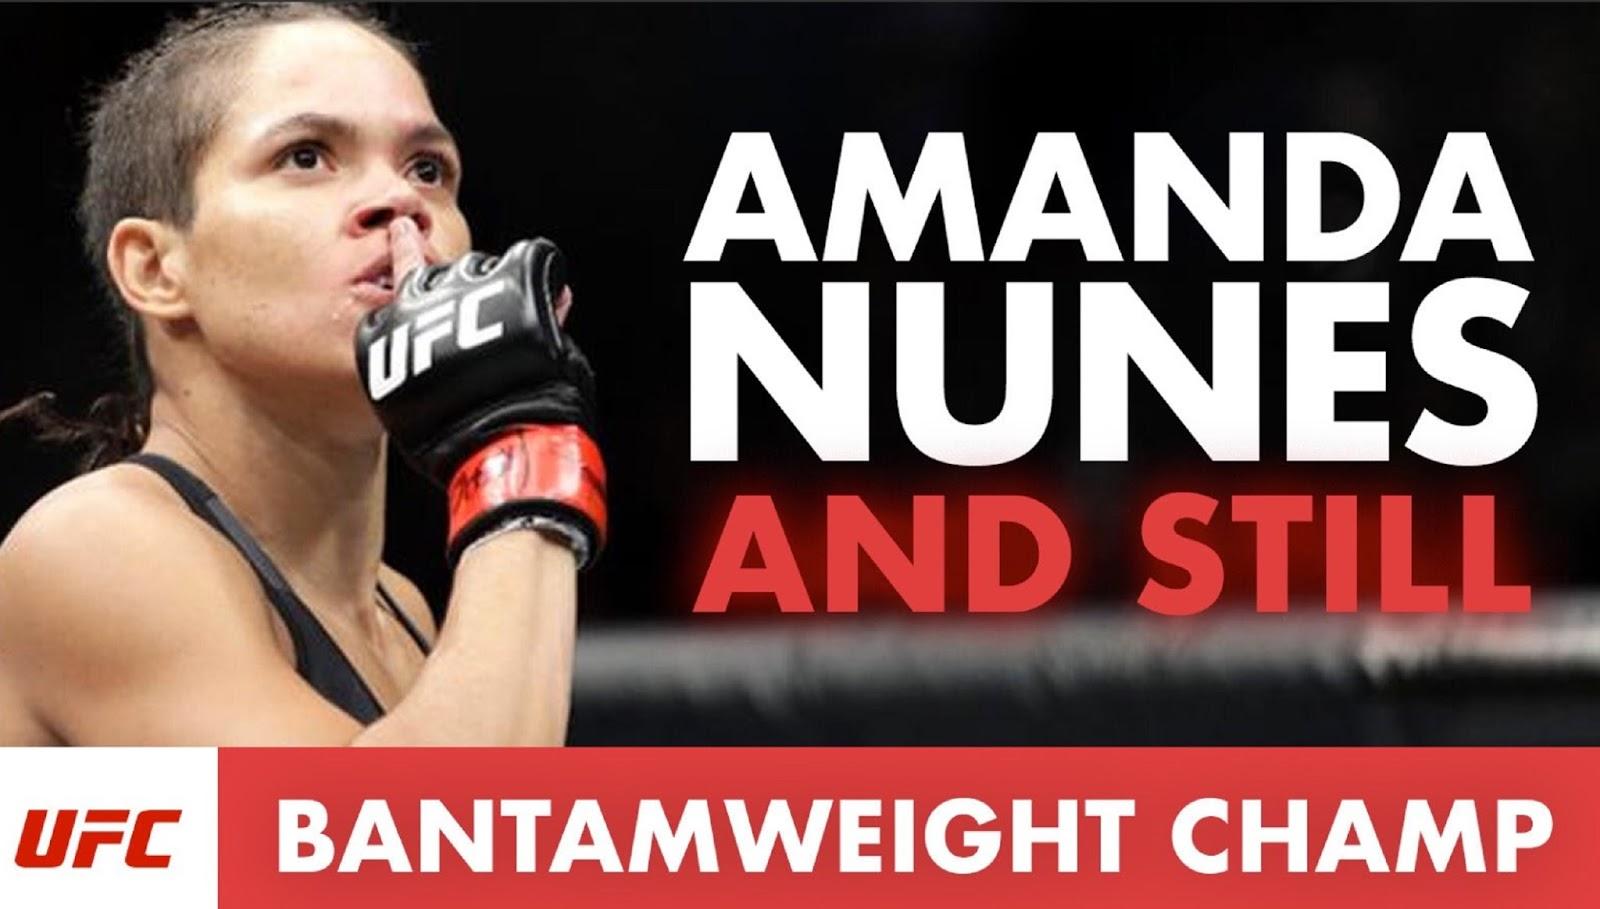 AMANDA NUNES 6